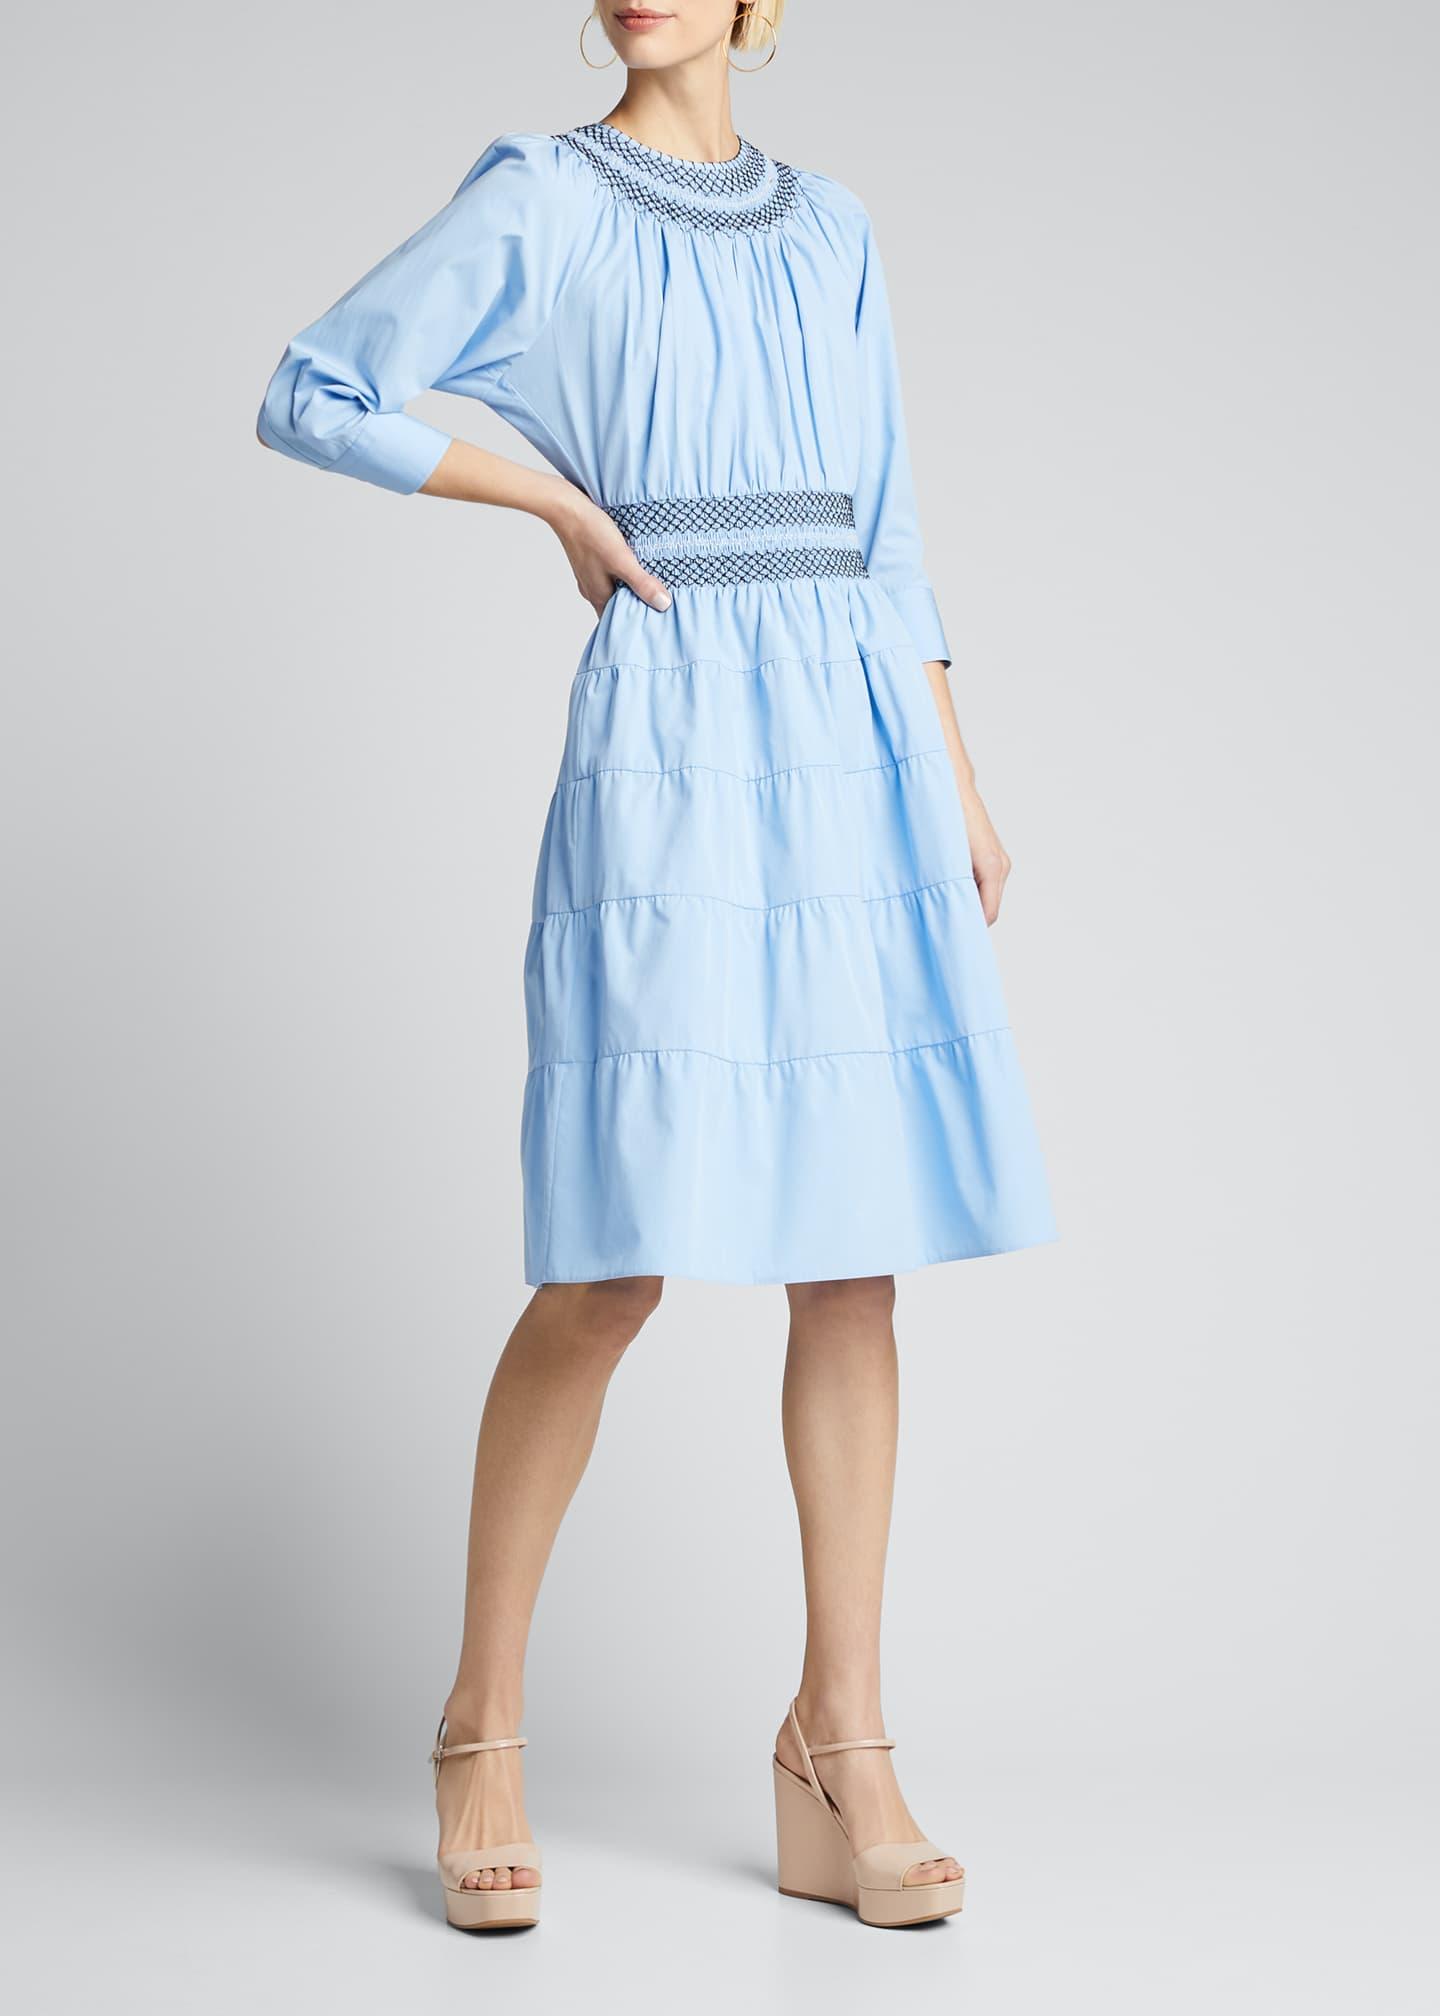 Prada Compact Poplin Smocked Tiered-Skirt Dress